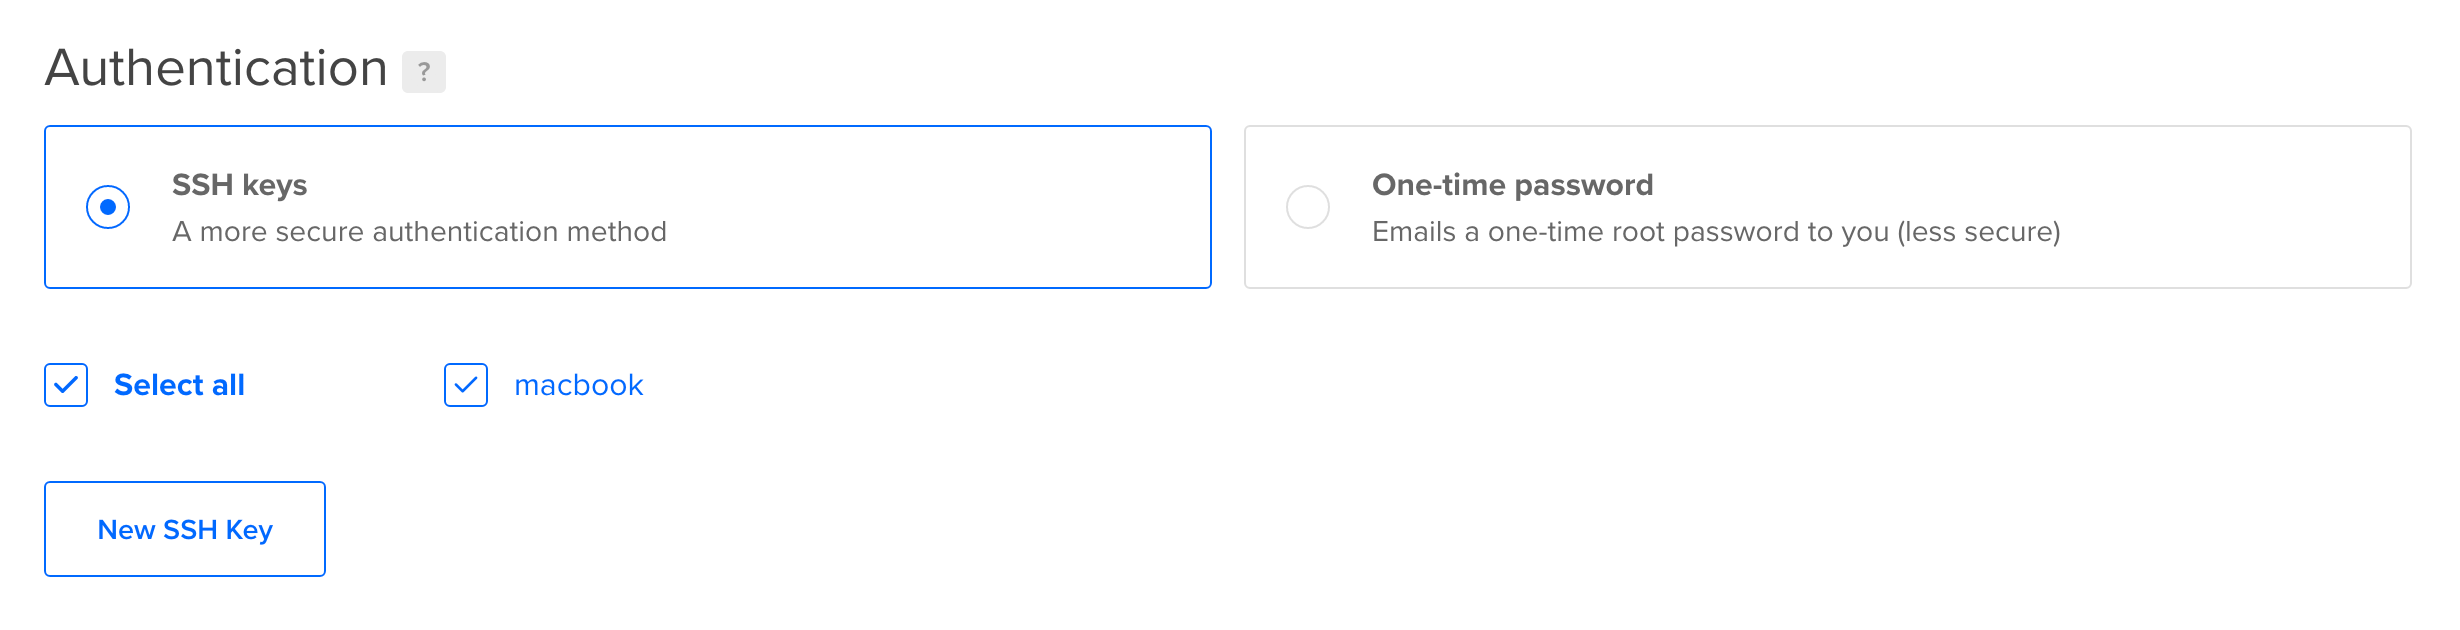 How to Install & Setup Dokku on DigitalOcean